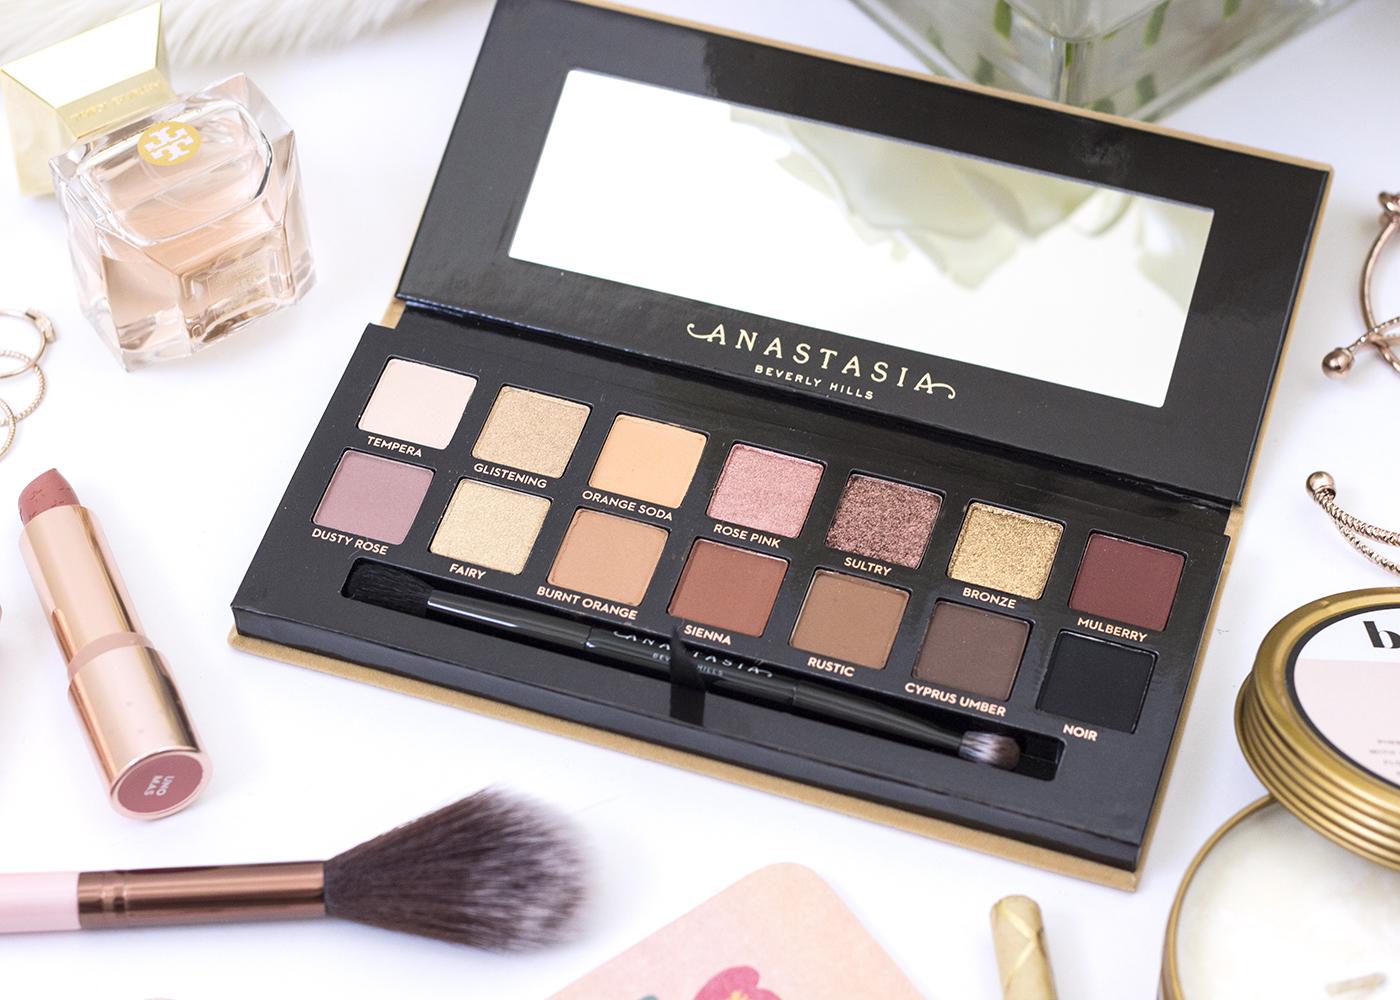 Anastasia Beverly Hills Soft Glam Palette Interior Packaging